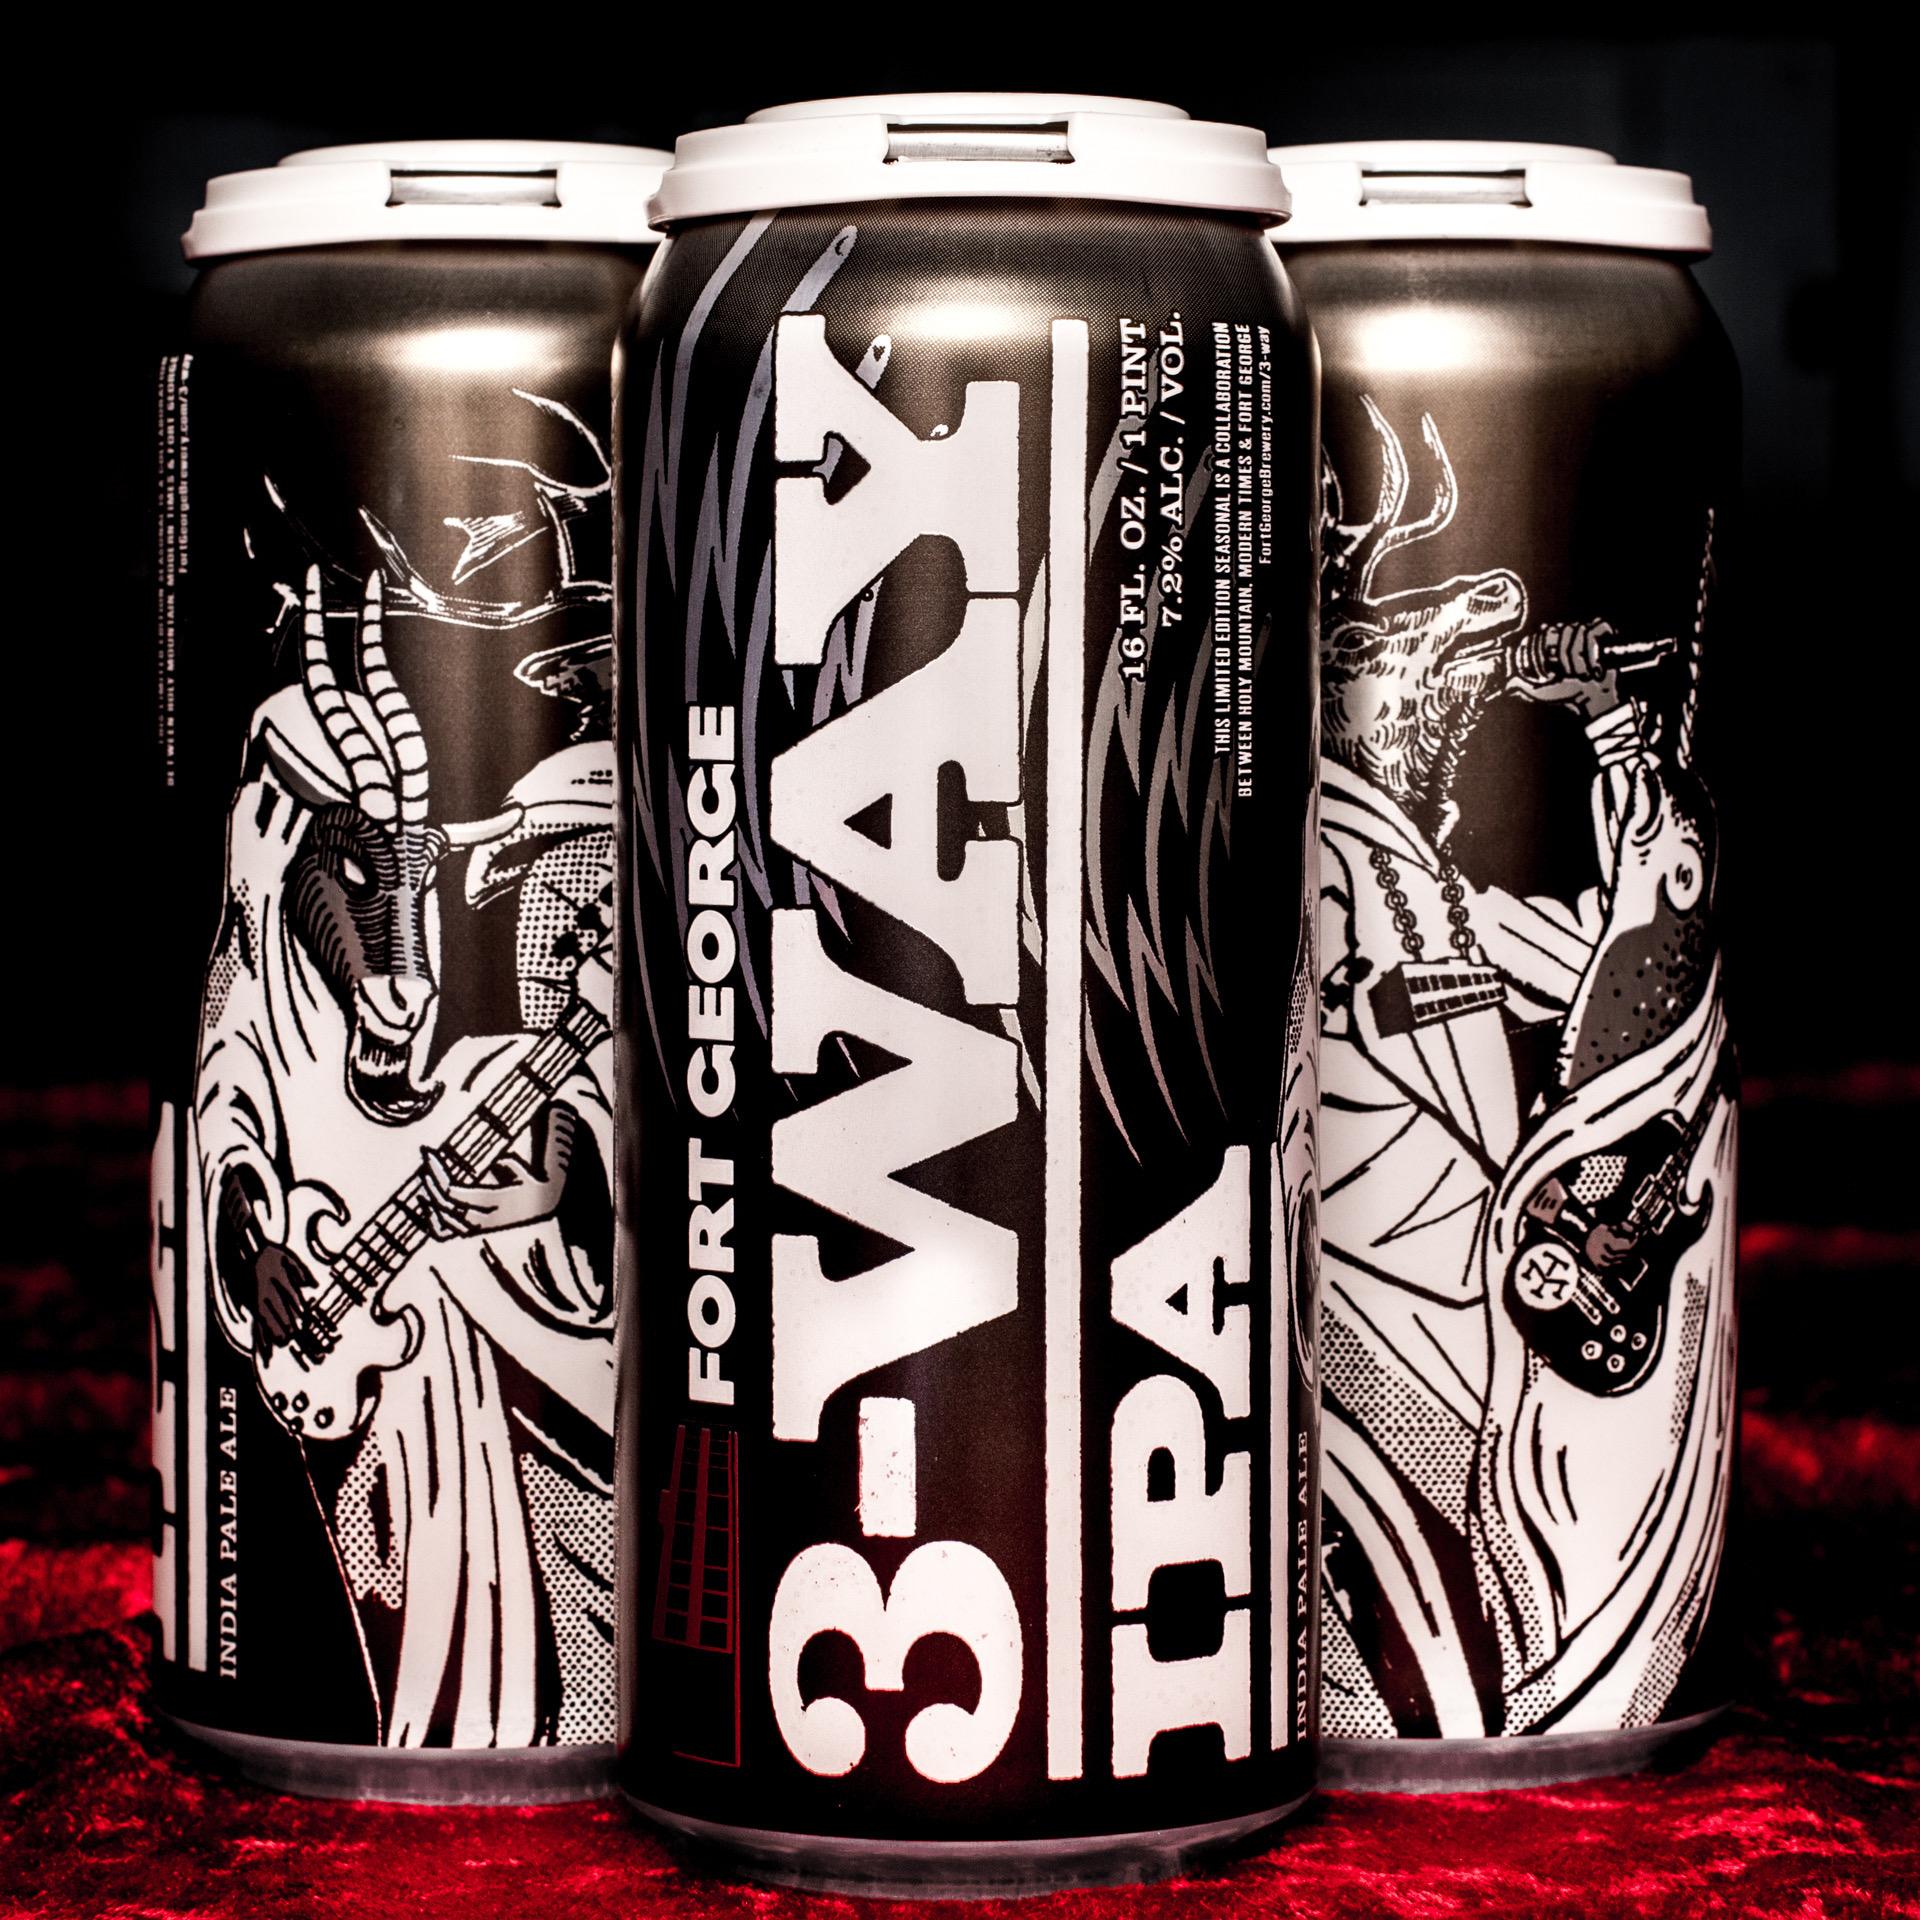 3-Way 4-pack